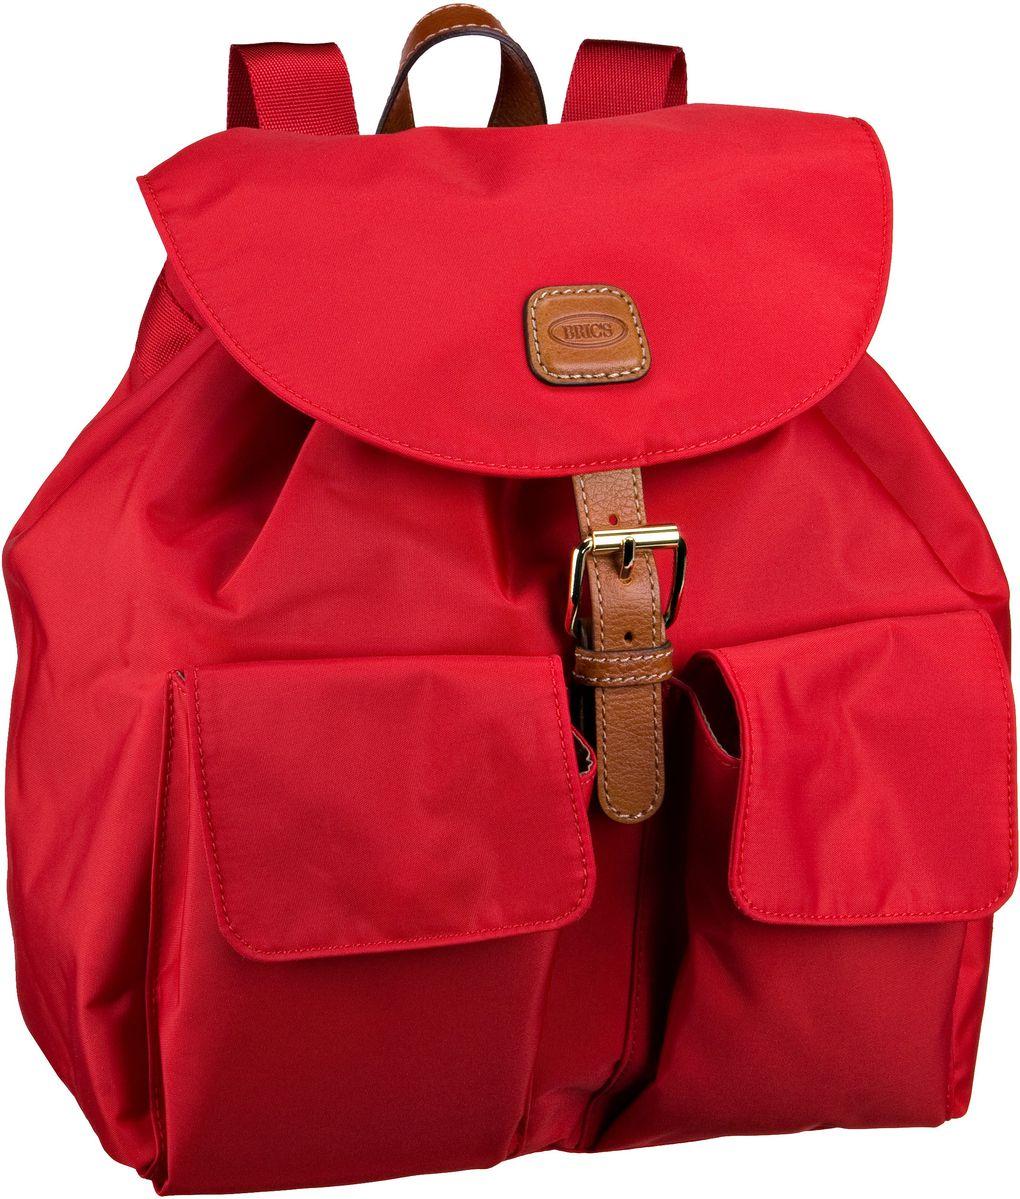 Bric´s X-Travel Rucksack 27 Rot (innen: Beige) - / Daypack Sale Angebote Guhrow